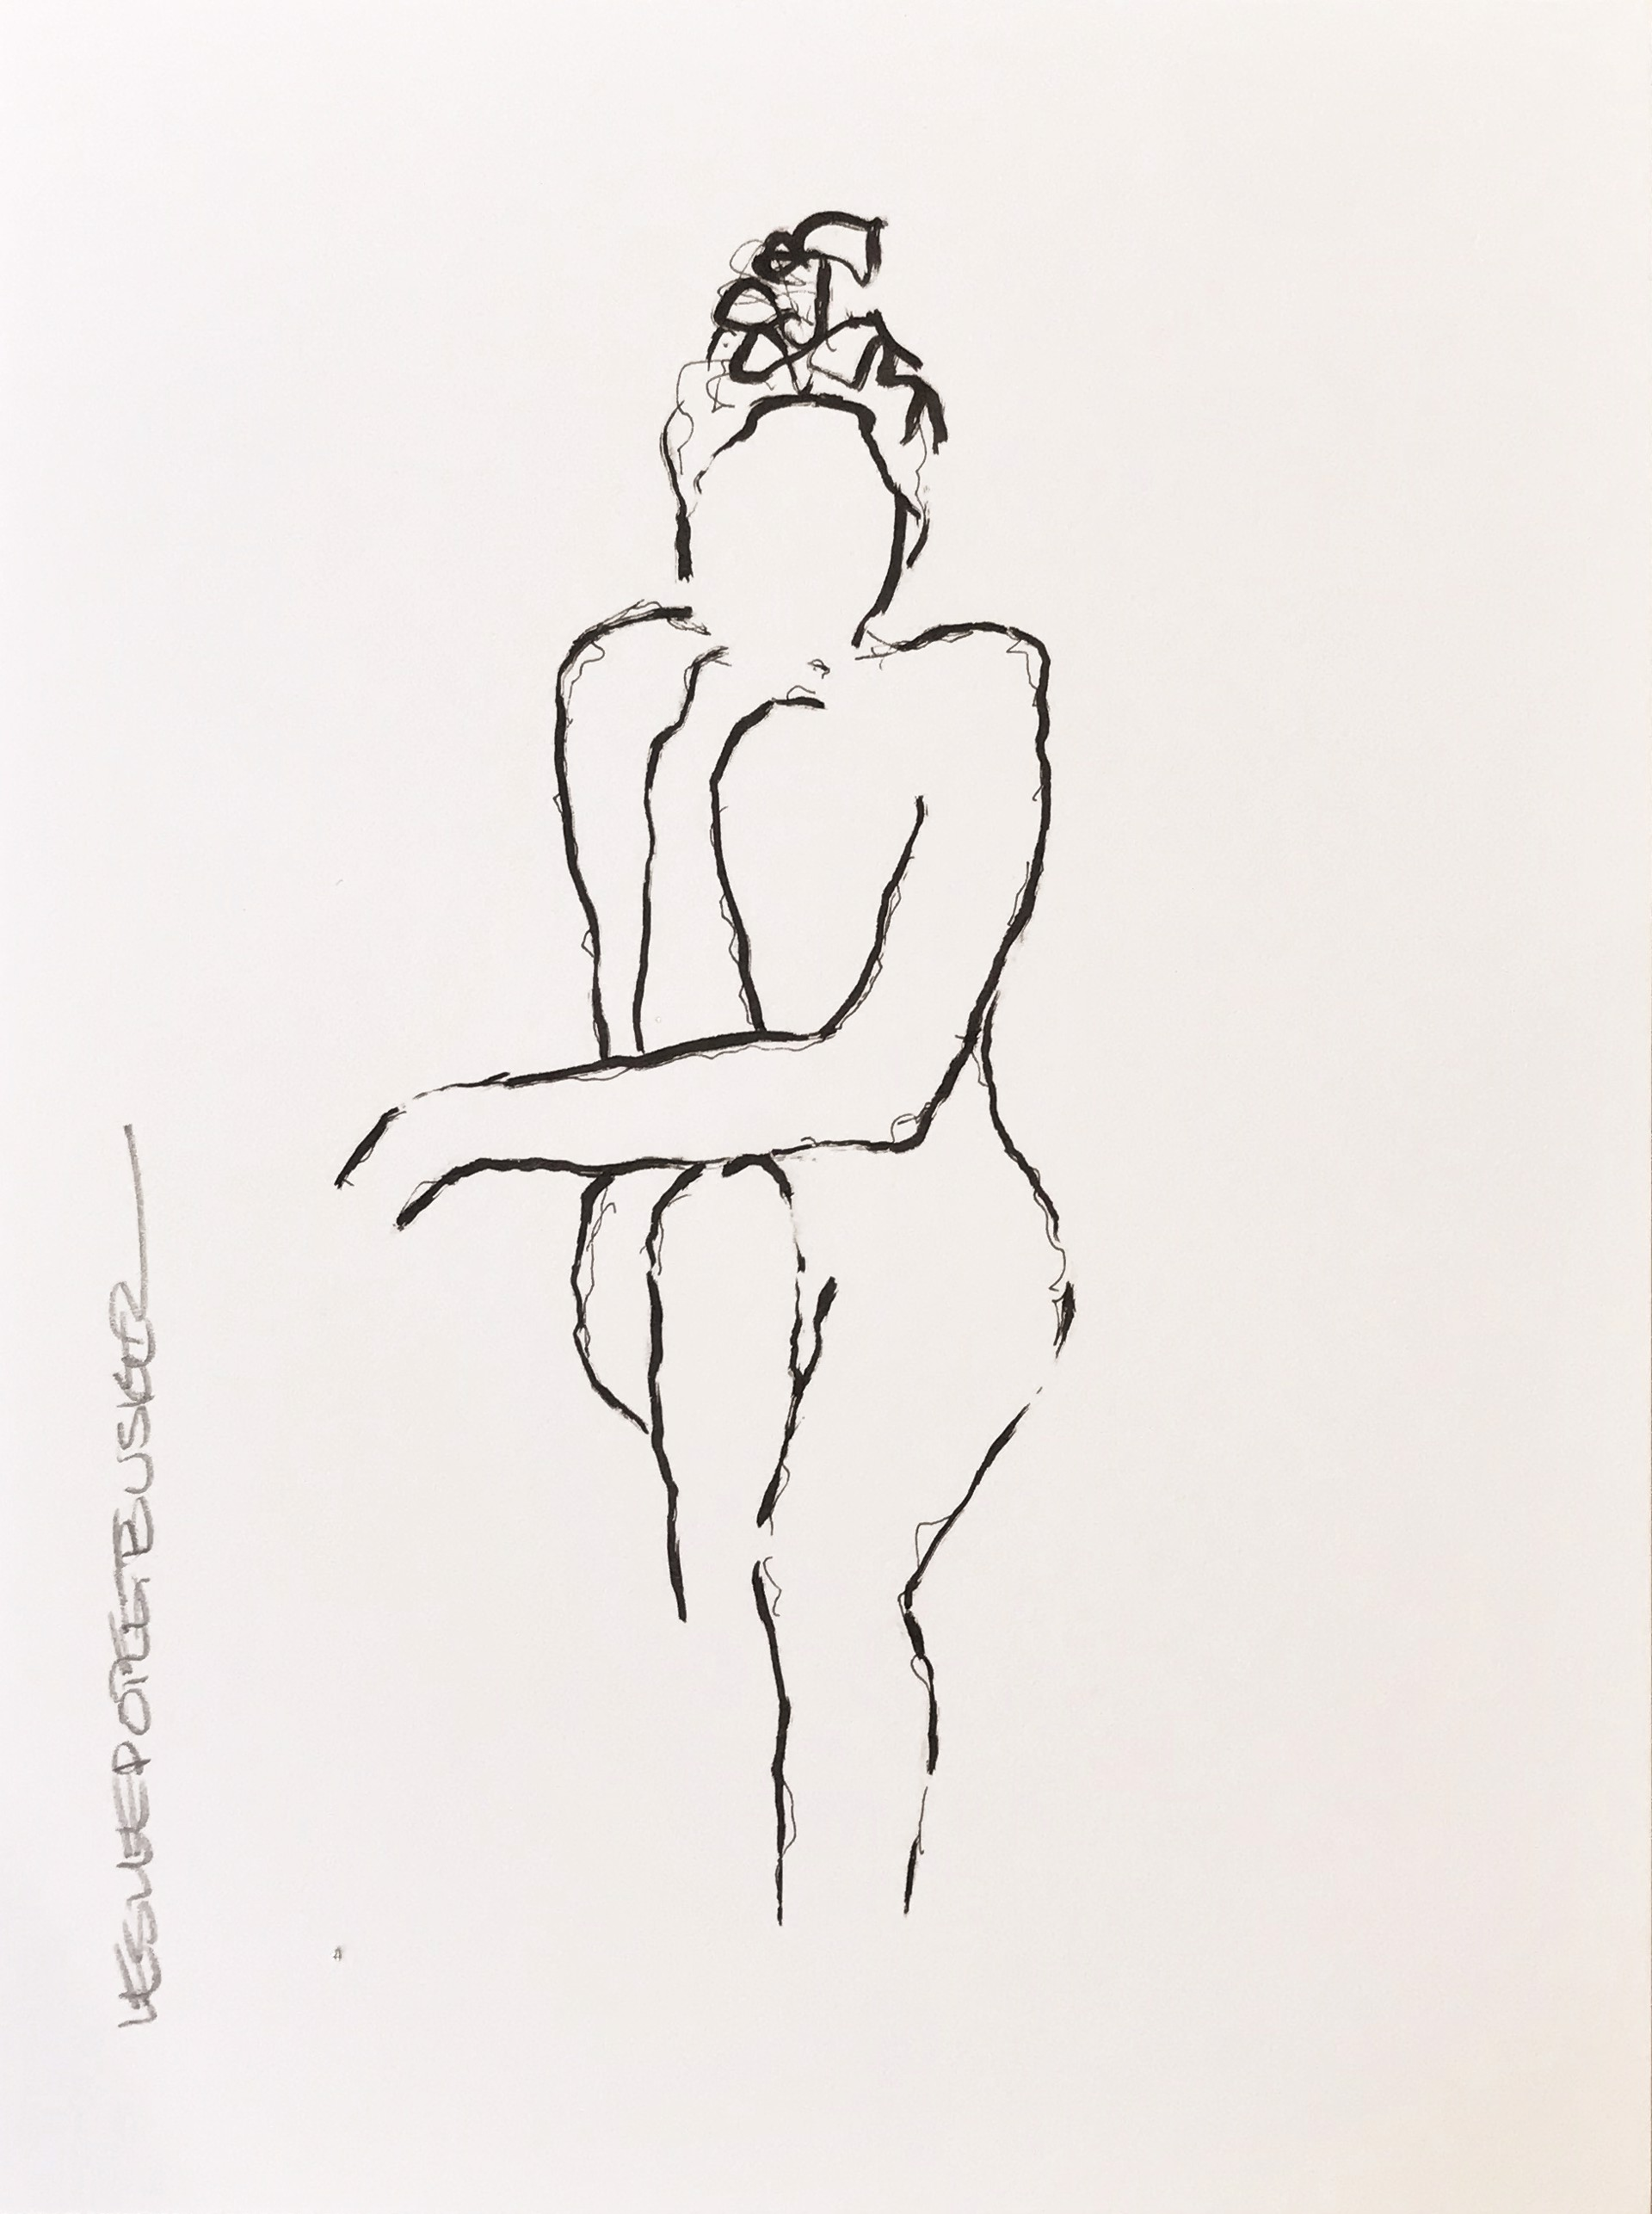 Figure No. 86 by Leslie Poteet Busker